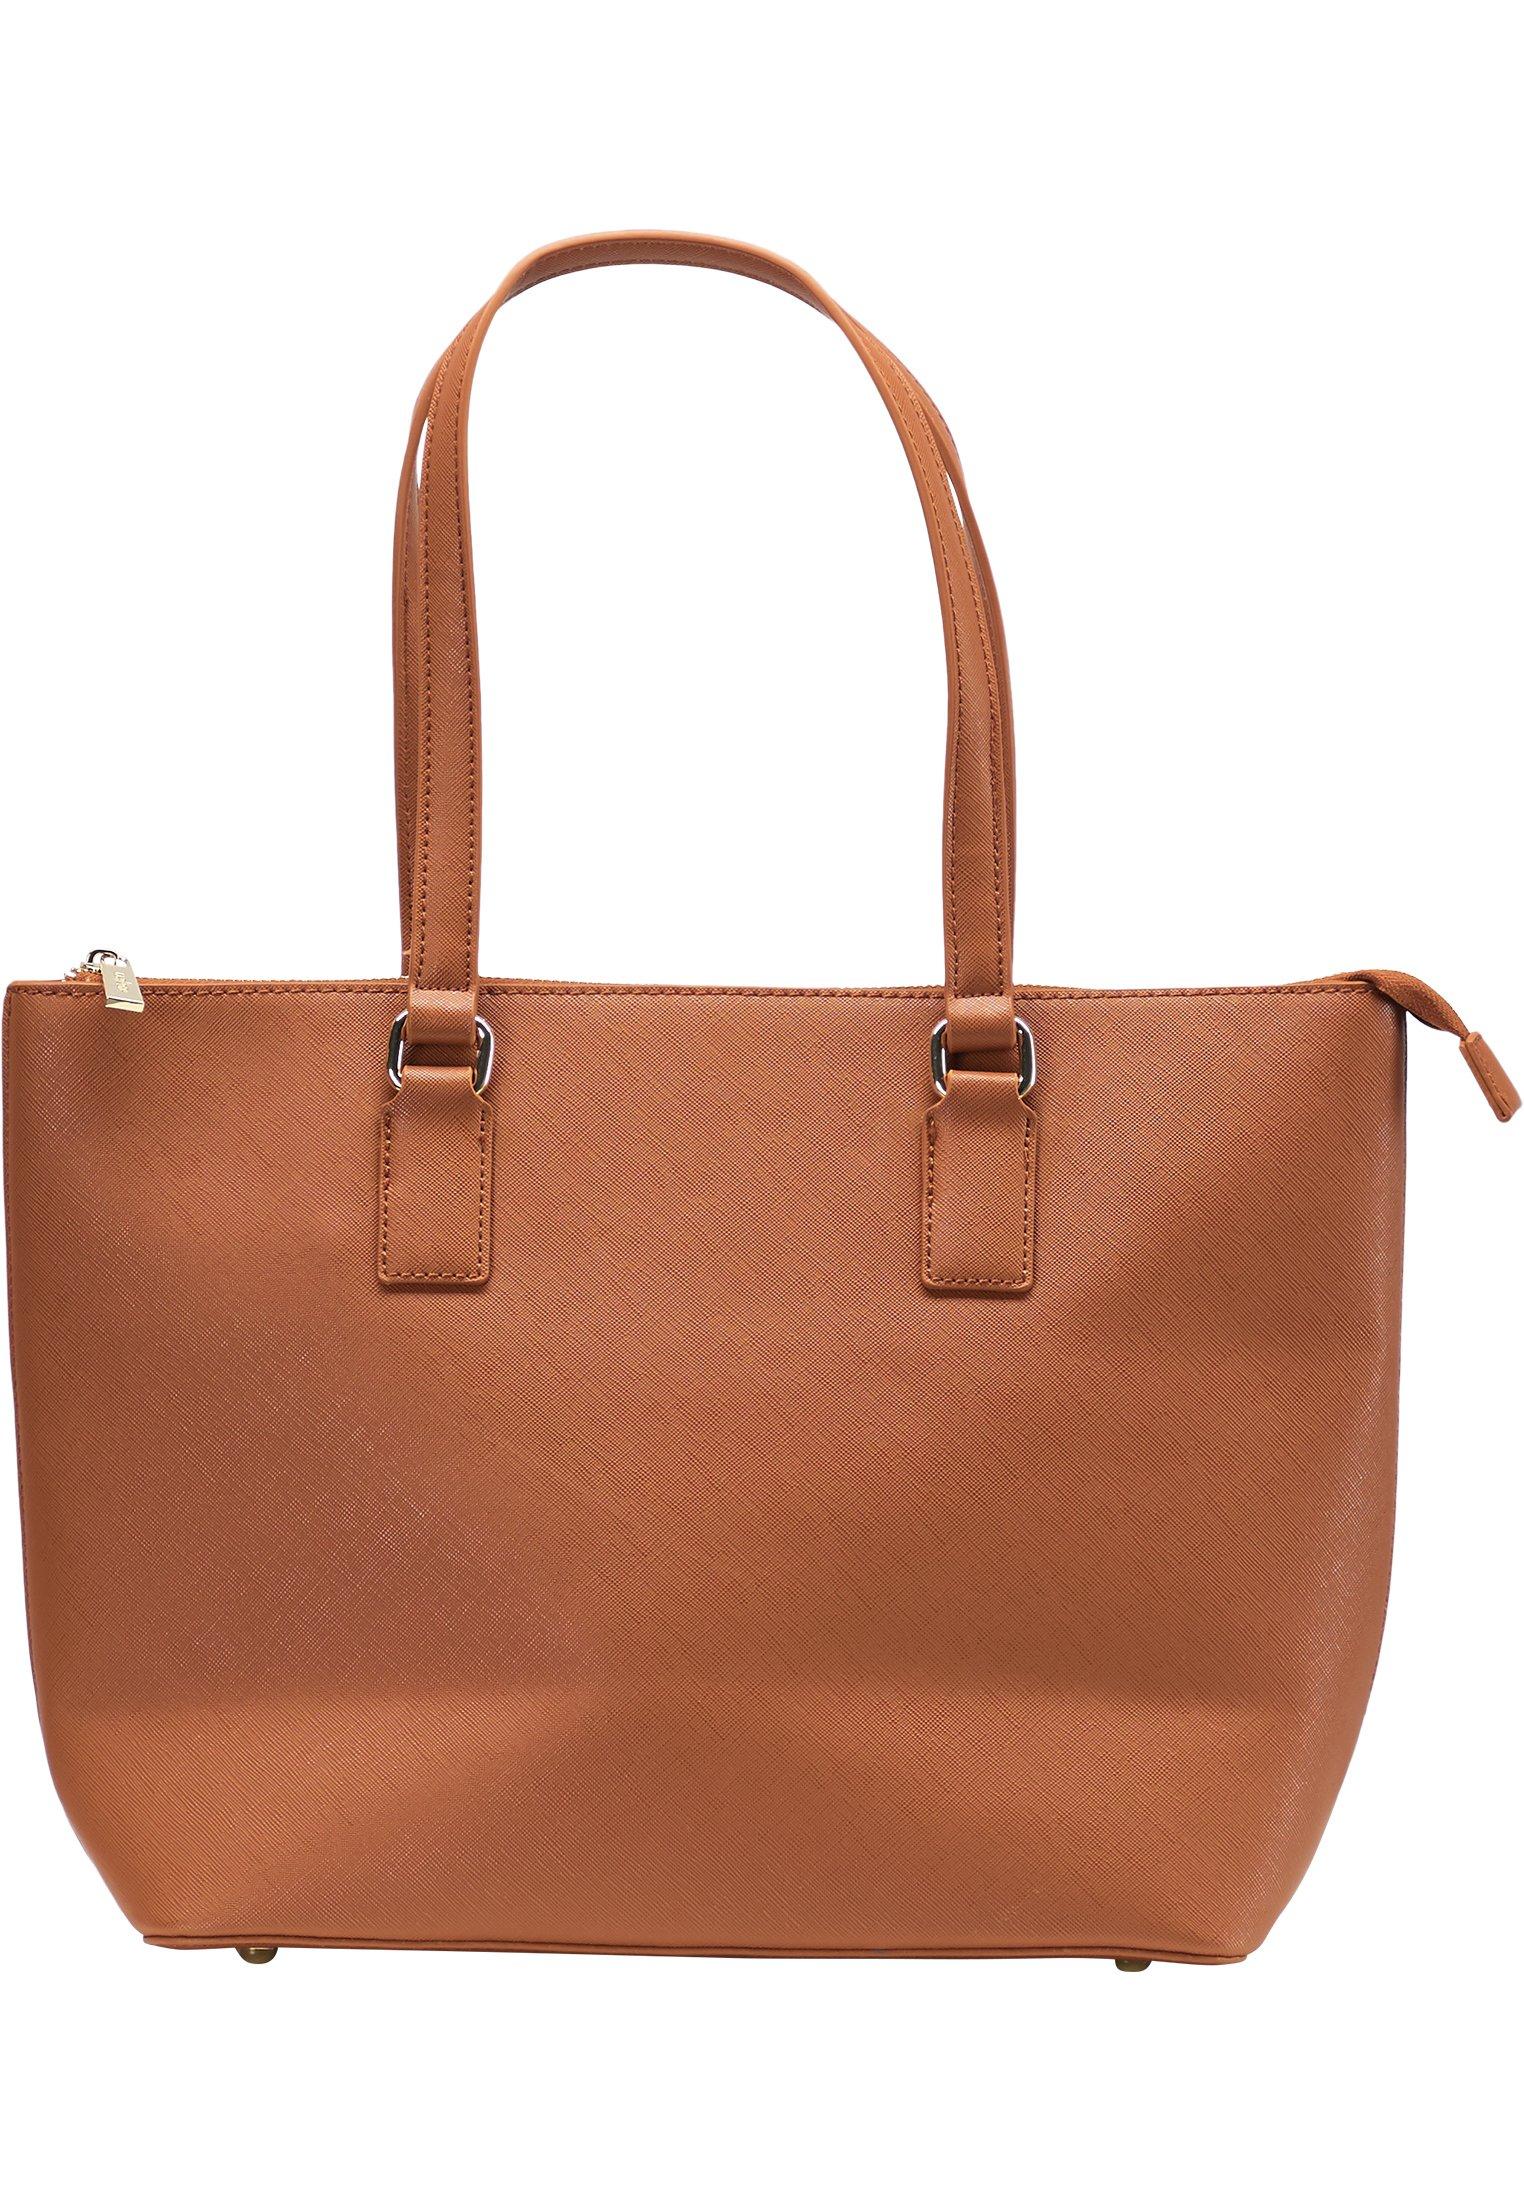 Damen Handtasche